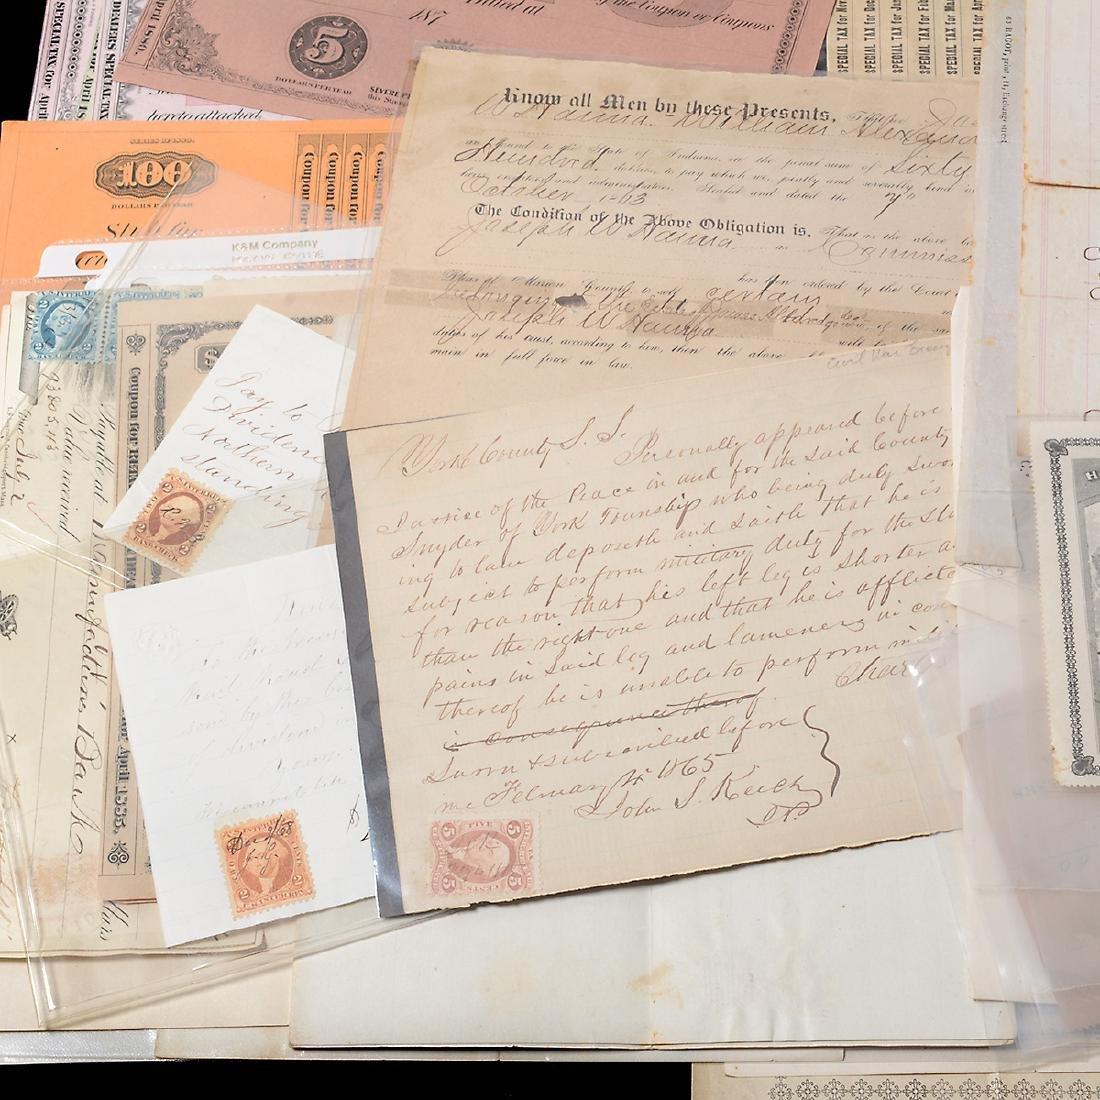 U.S Revenue Papers & Checks, 19th Century (100) - 5